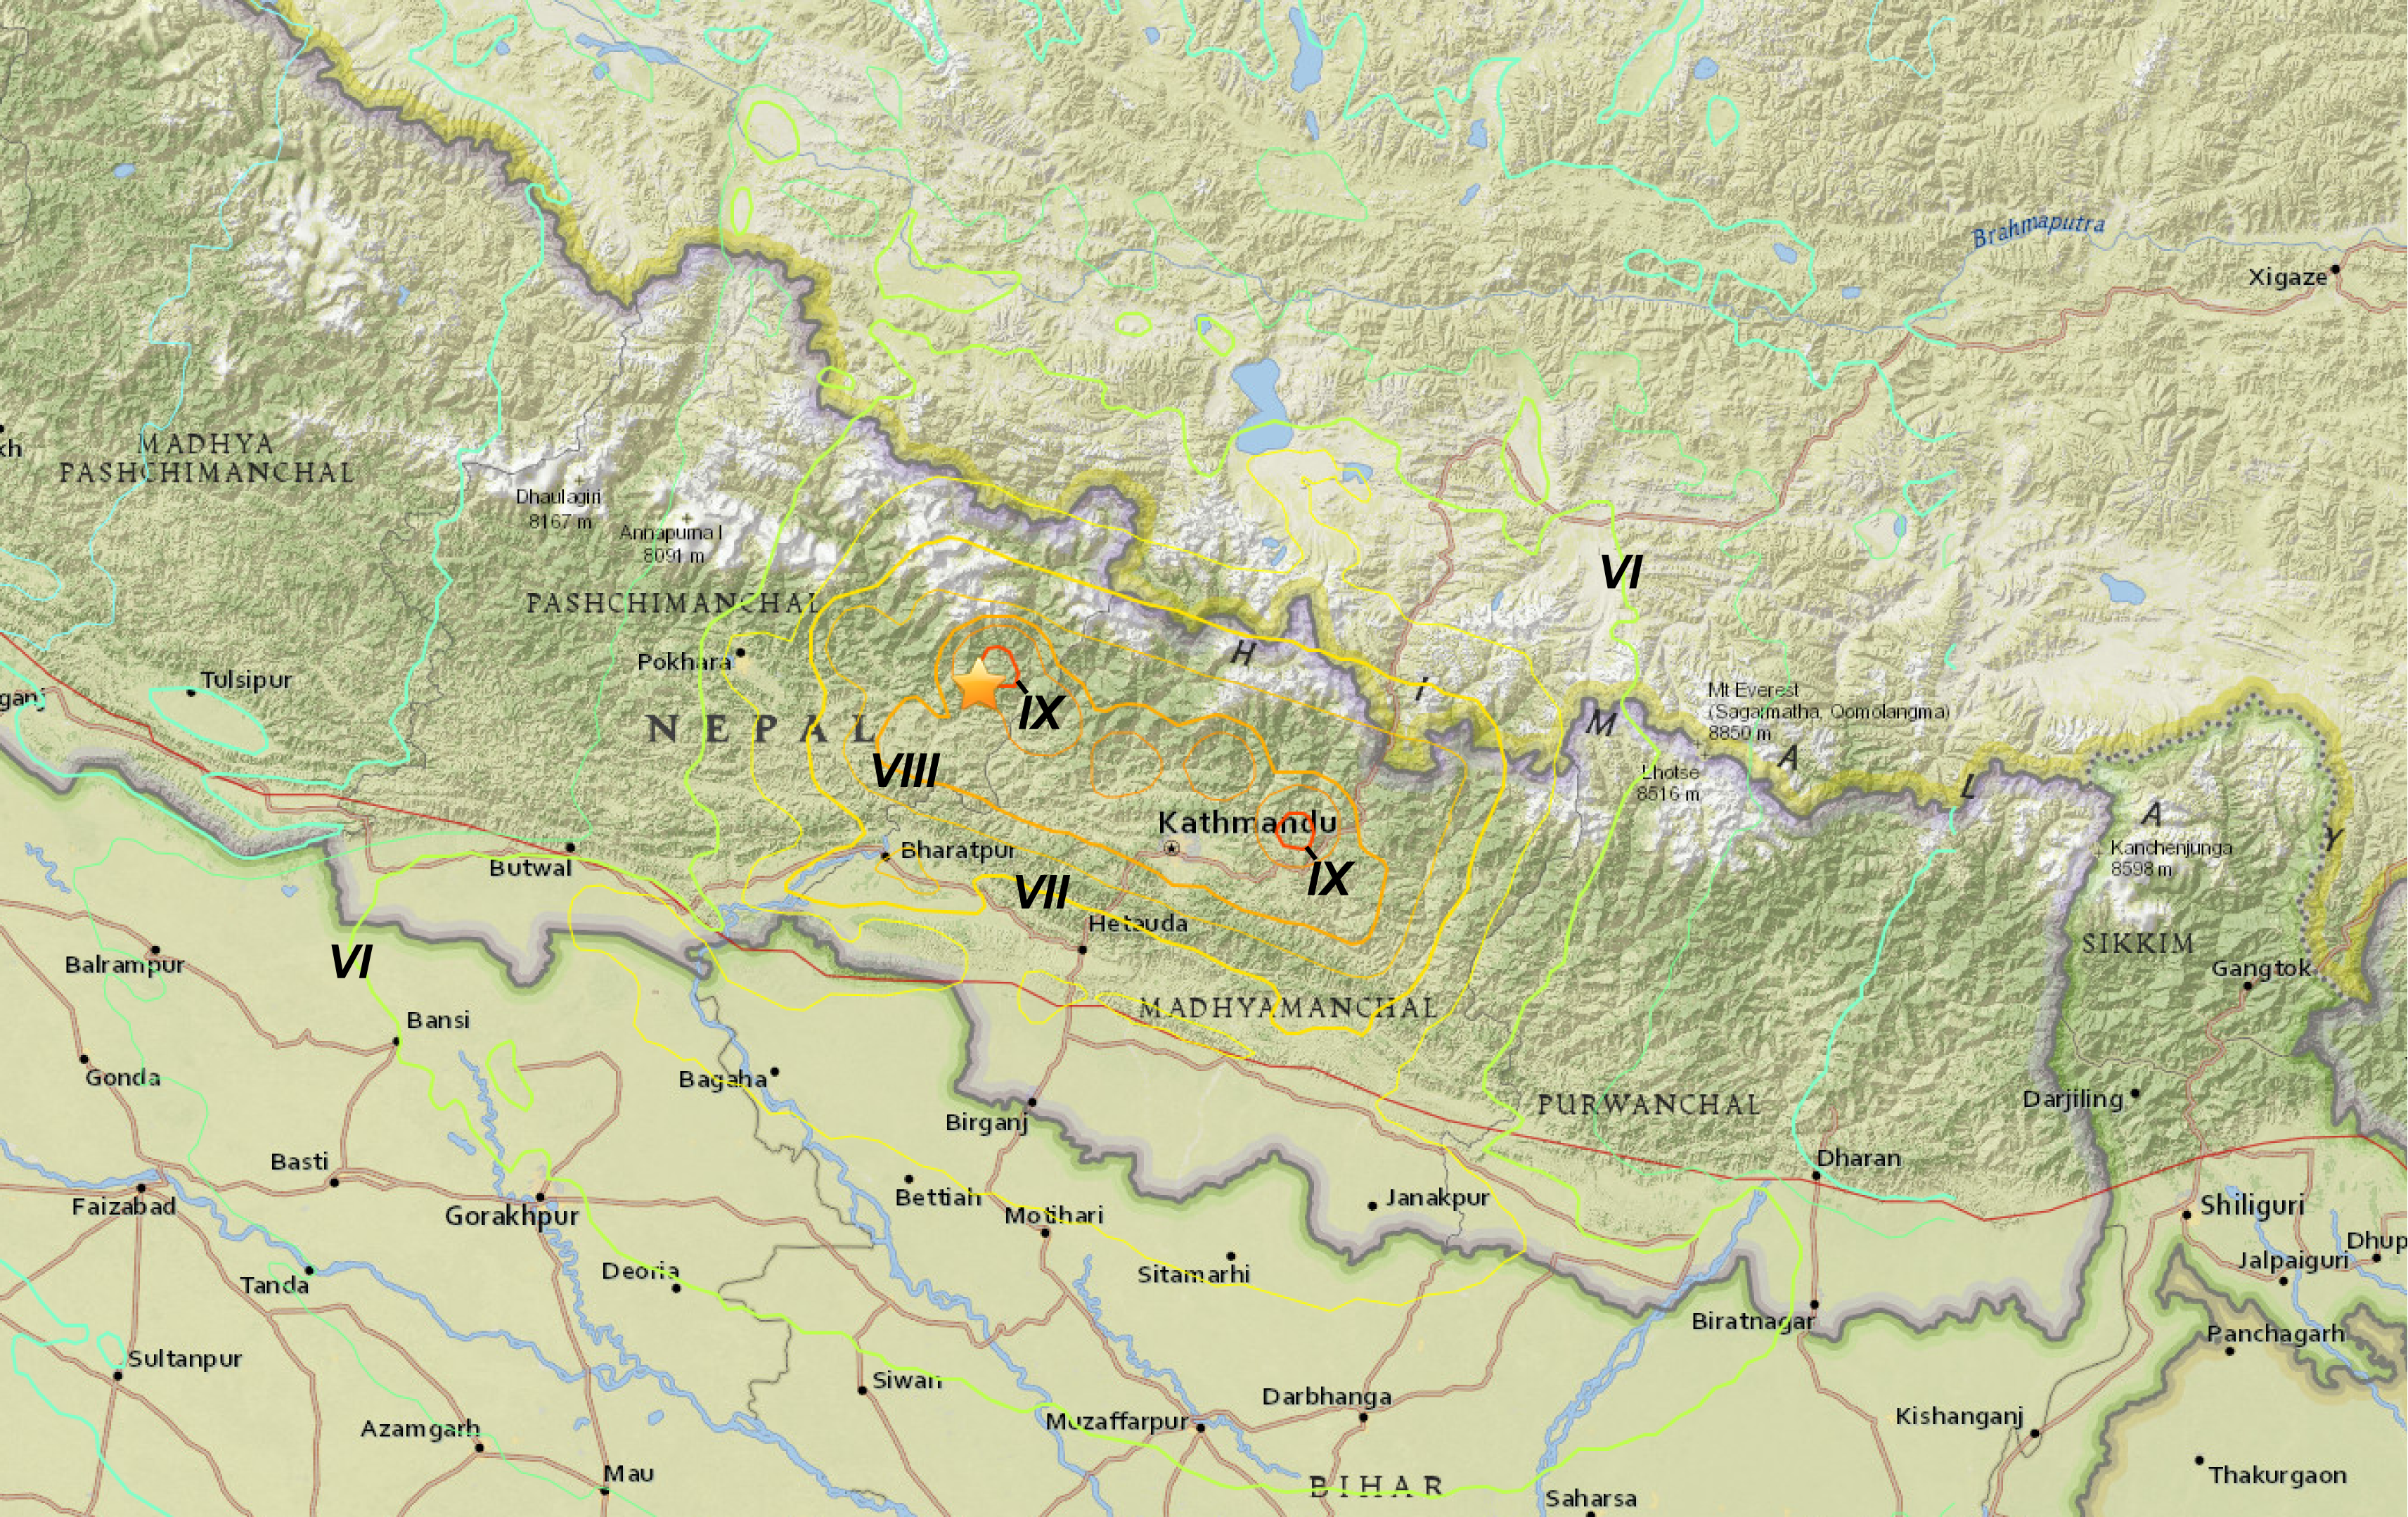 Filegorkha isoseismal map usgs annotatedg wikimedia commons filegorkha isoseismal map usgs annotatedg gumiabroncs Choice Image